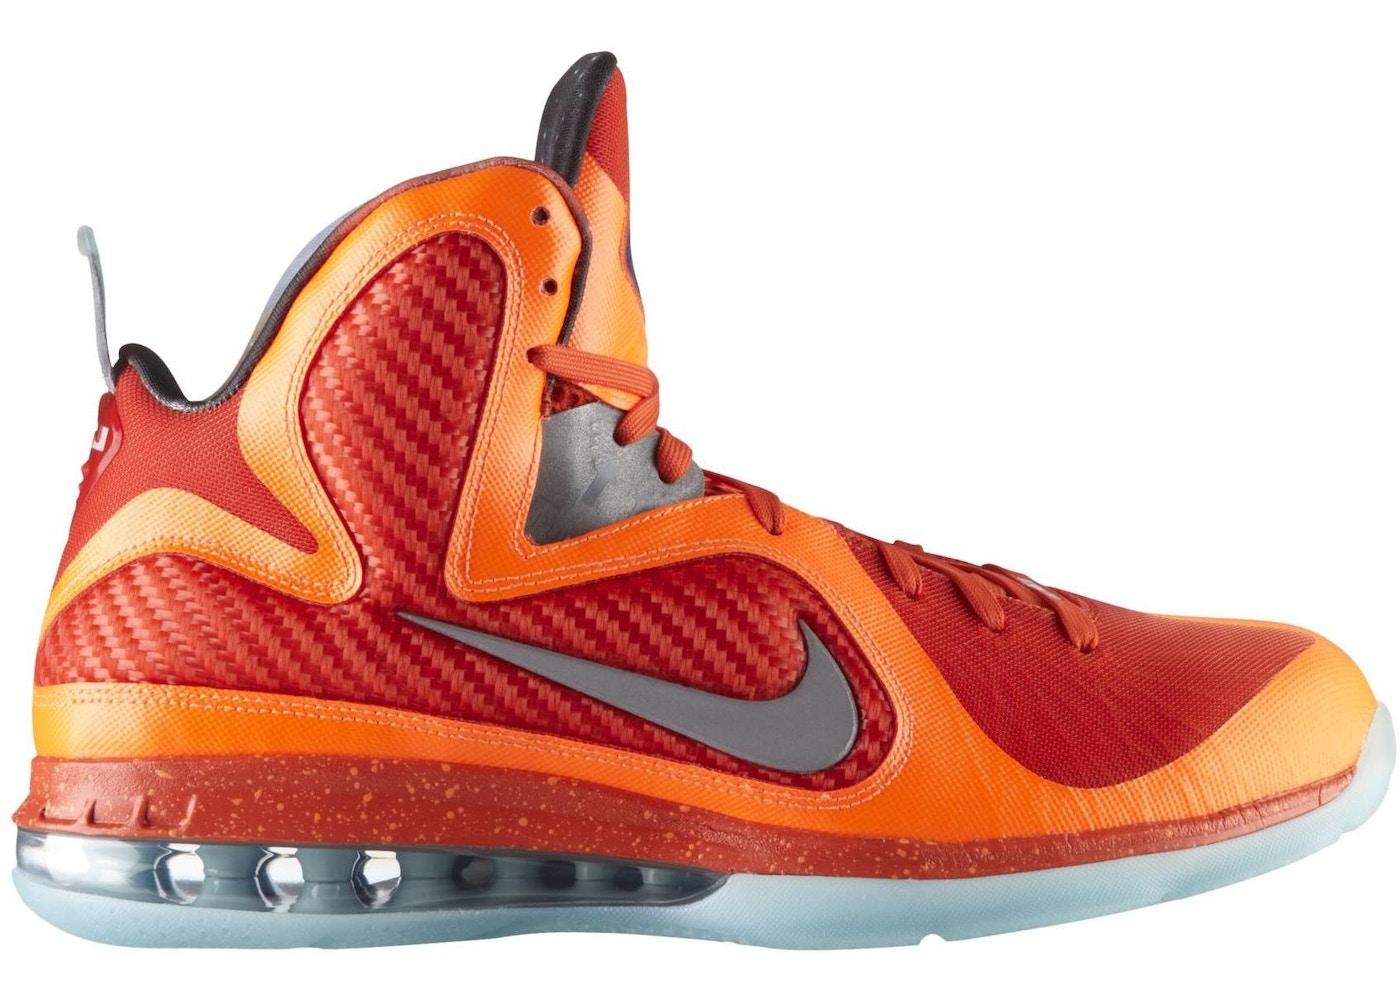 e619f0d461b Nike LeBron 9 Shoes - Average Sale Price